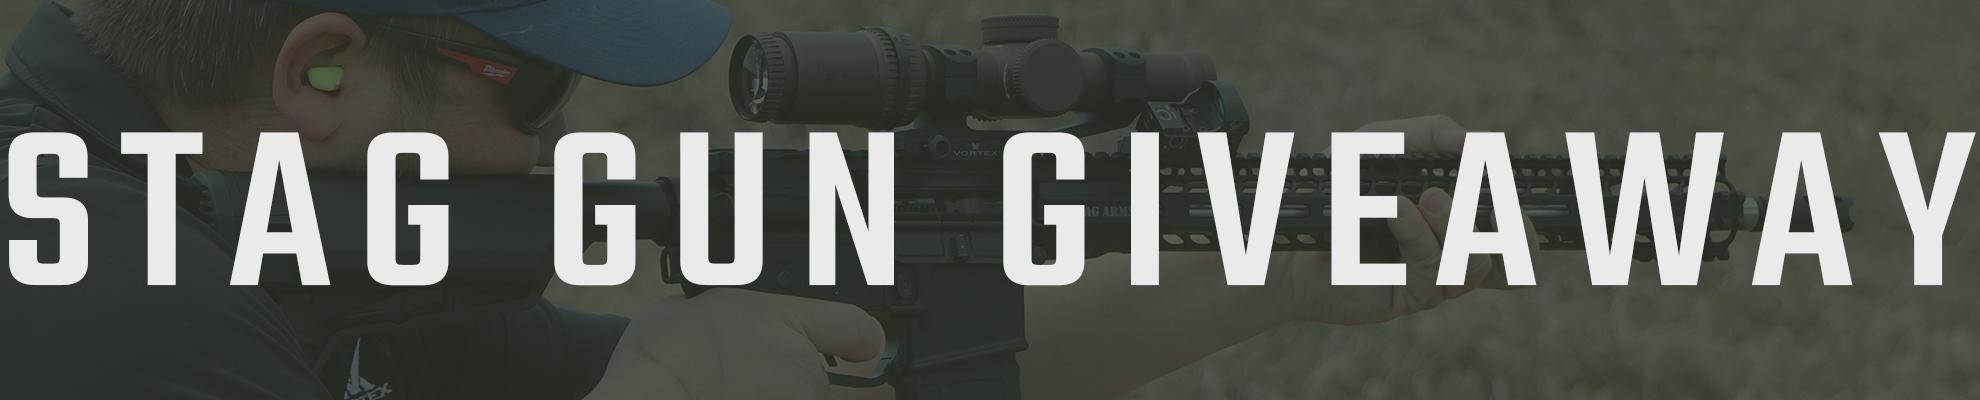 stag-gun-giveaway-banner1.jpg